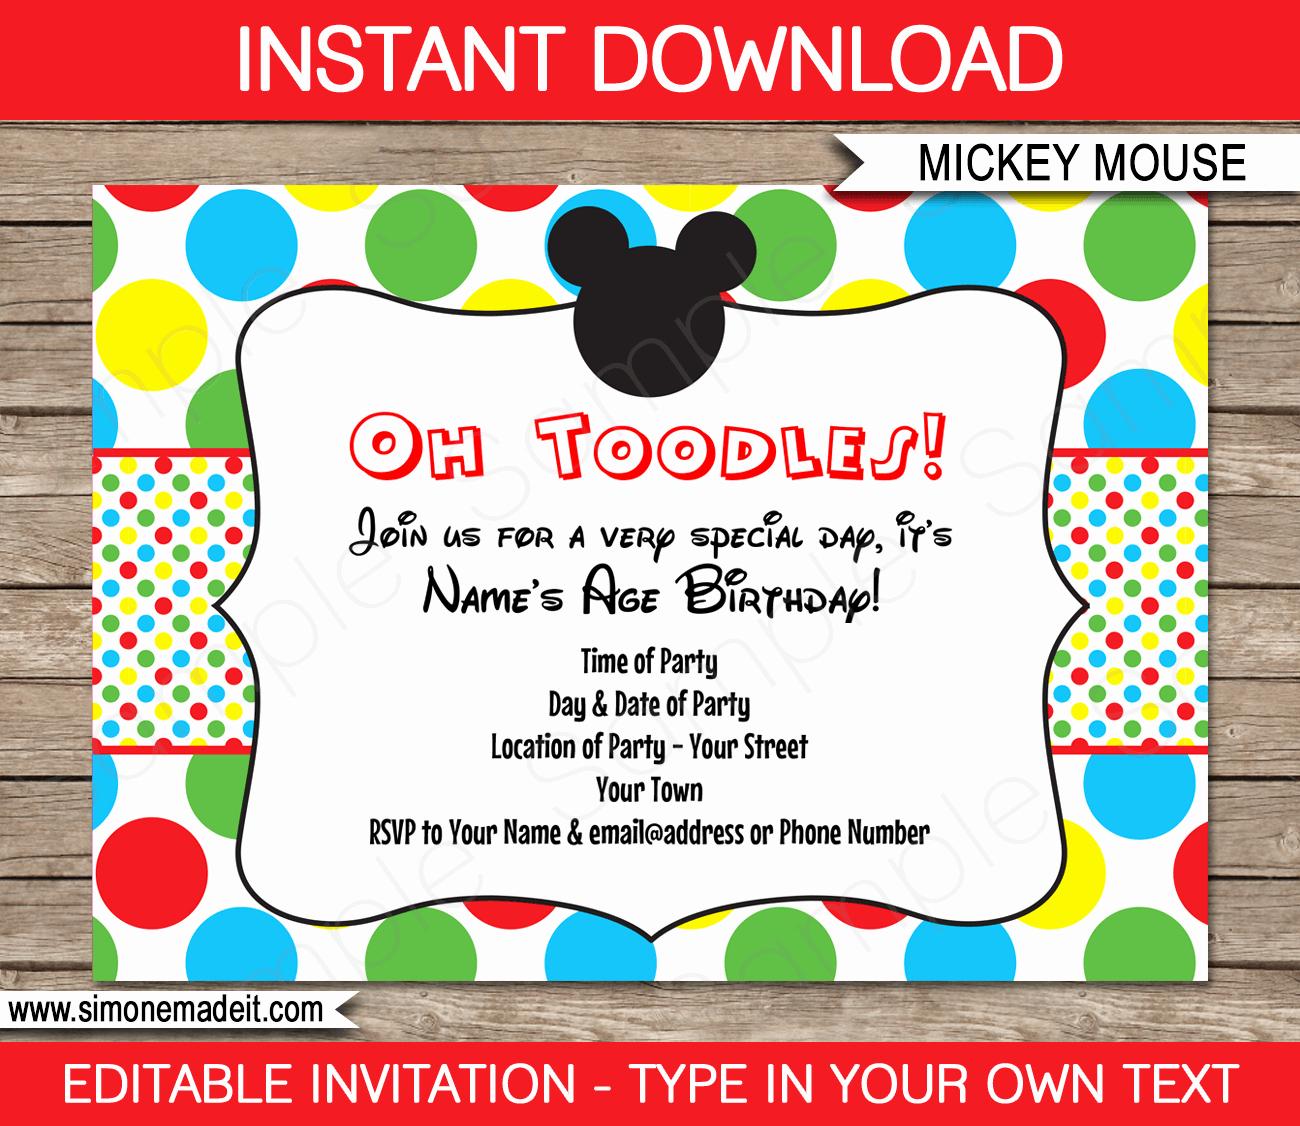 Diy Mickey Mouse Birthday Invitations Lovely Mickey Mouse Party Invitations Template